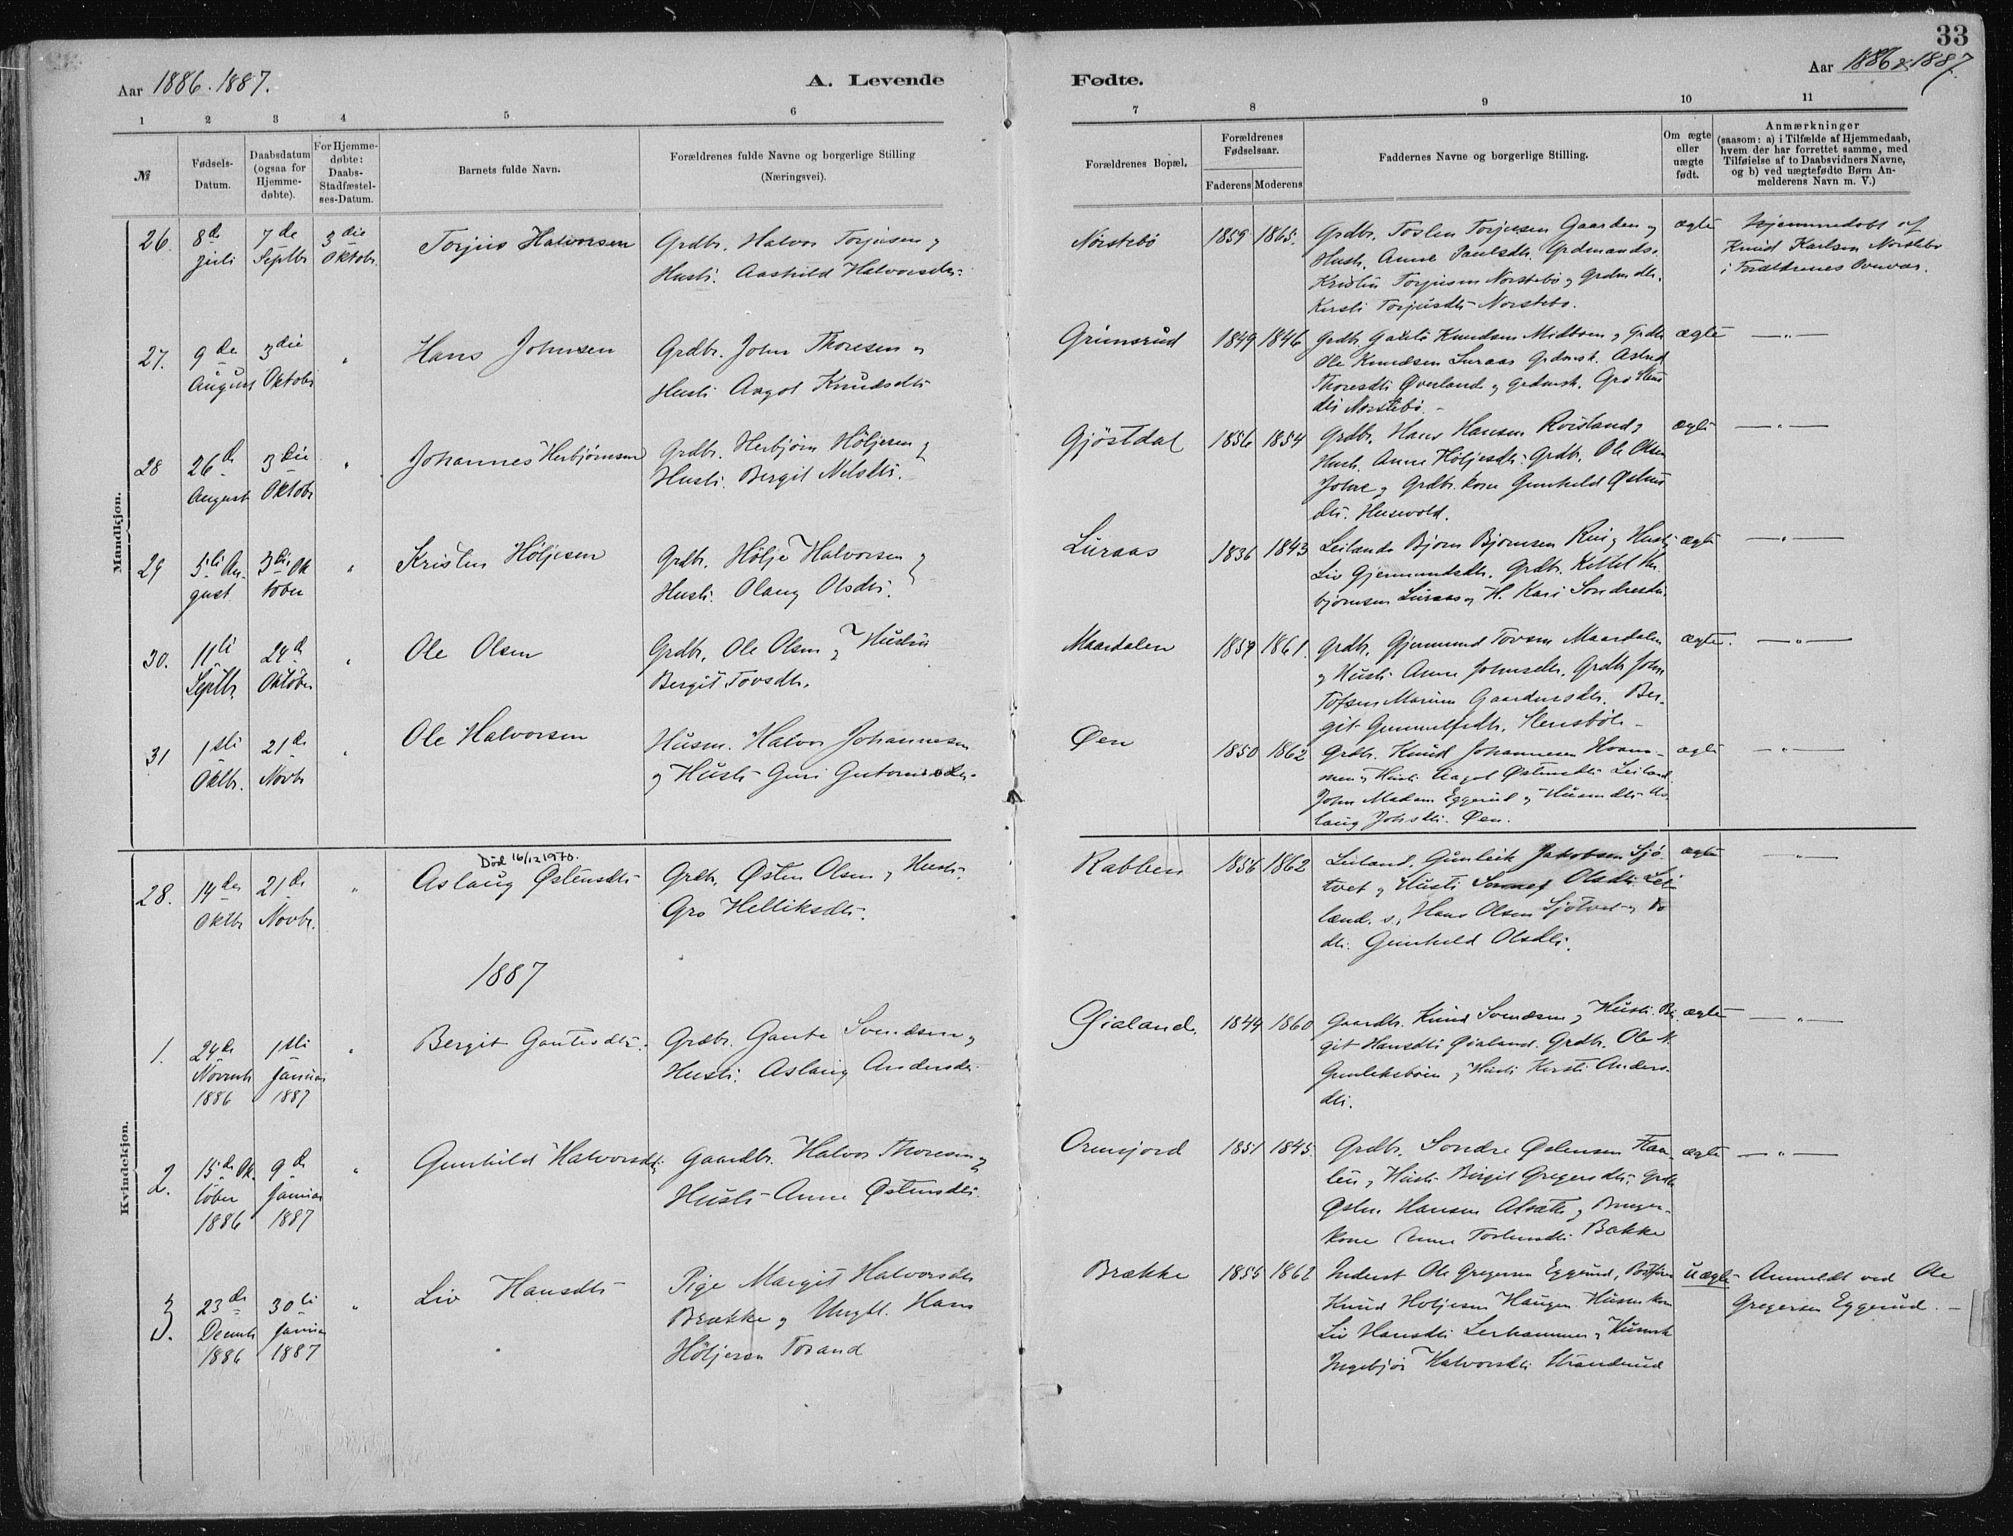 SAKO, Tinn kirkebøker, F/Fa/L0007: Ministerialbok nr. I 7, 1878-1922, s. 33